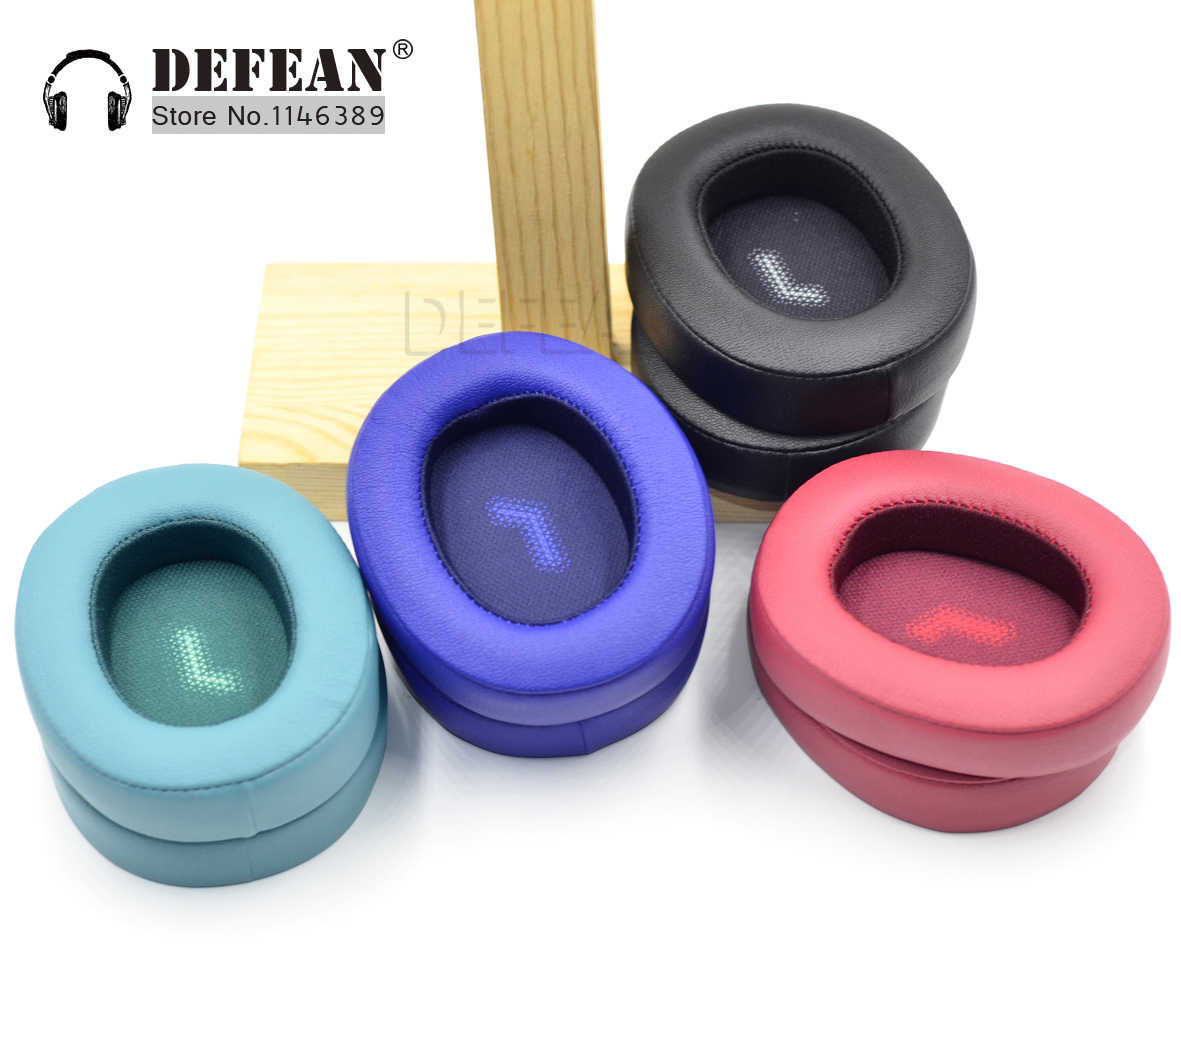 Replacement Cushion Ear Pads Cover For Jbl E55bt E 55 Bt Bluetooth Wireless Headsets Aliexpress